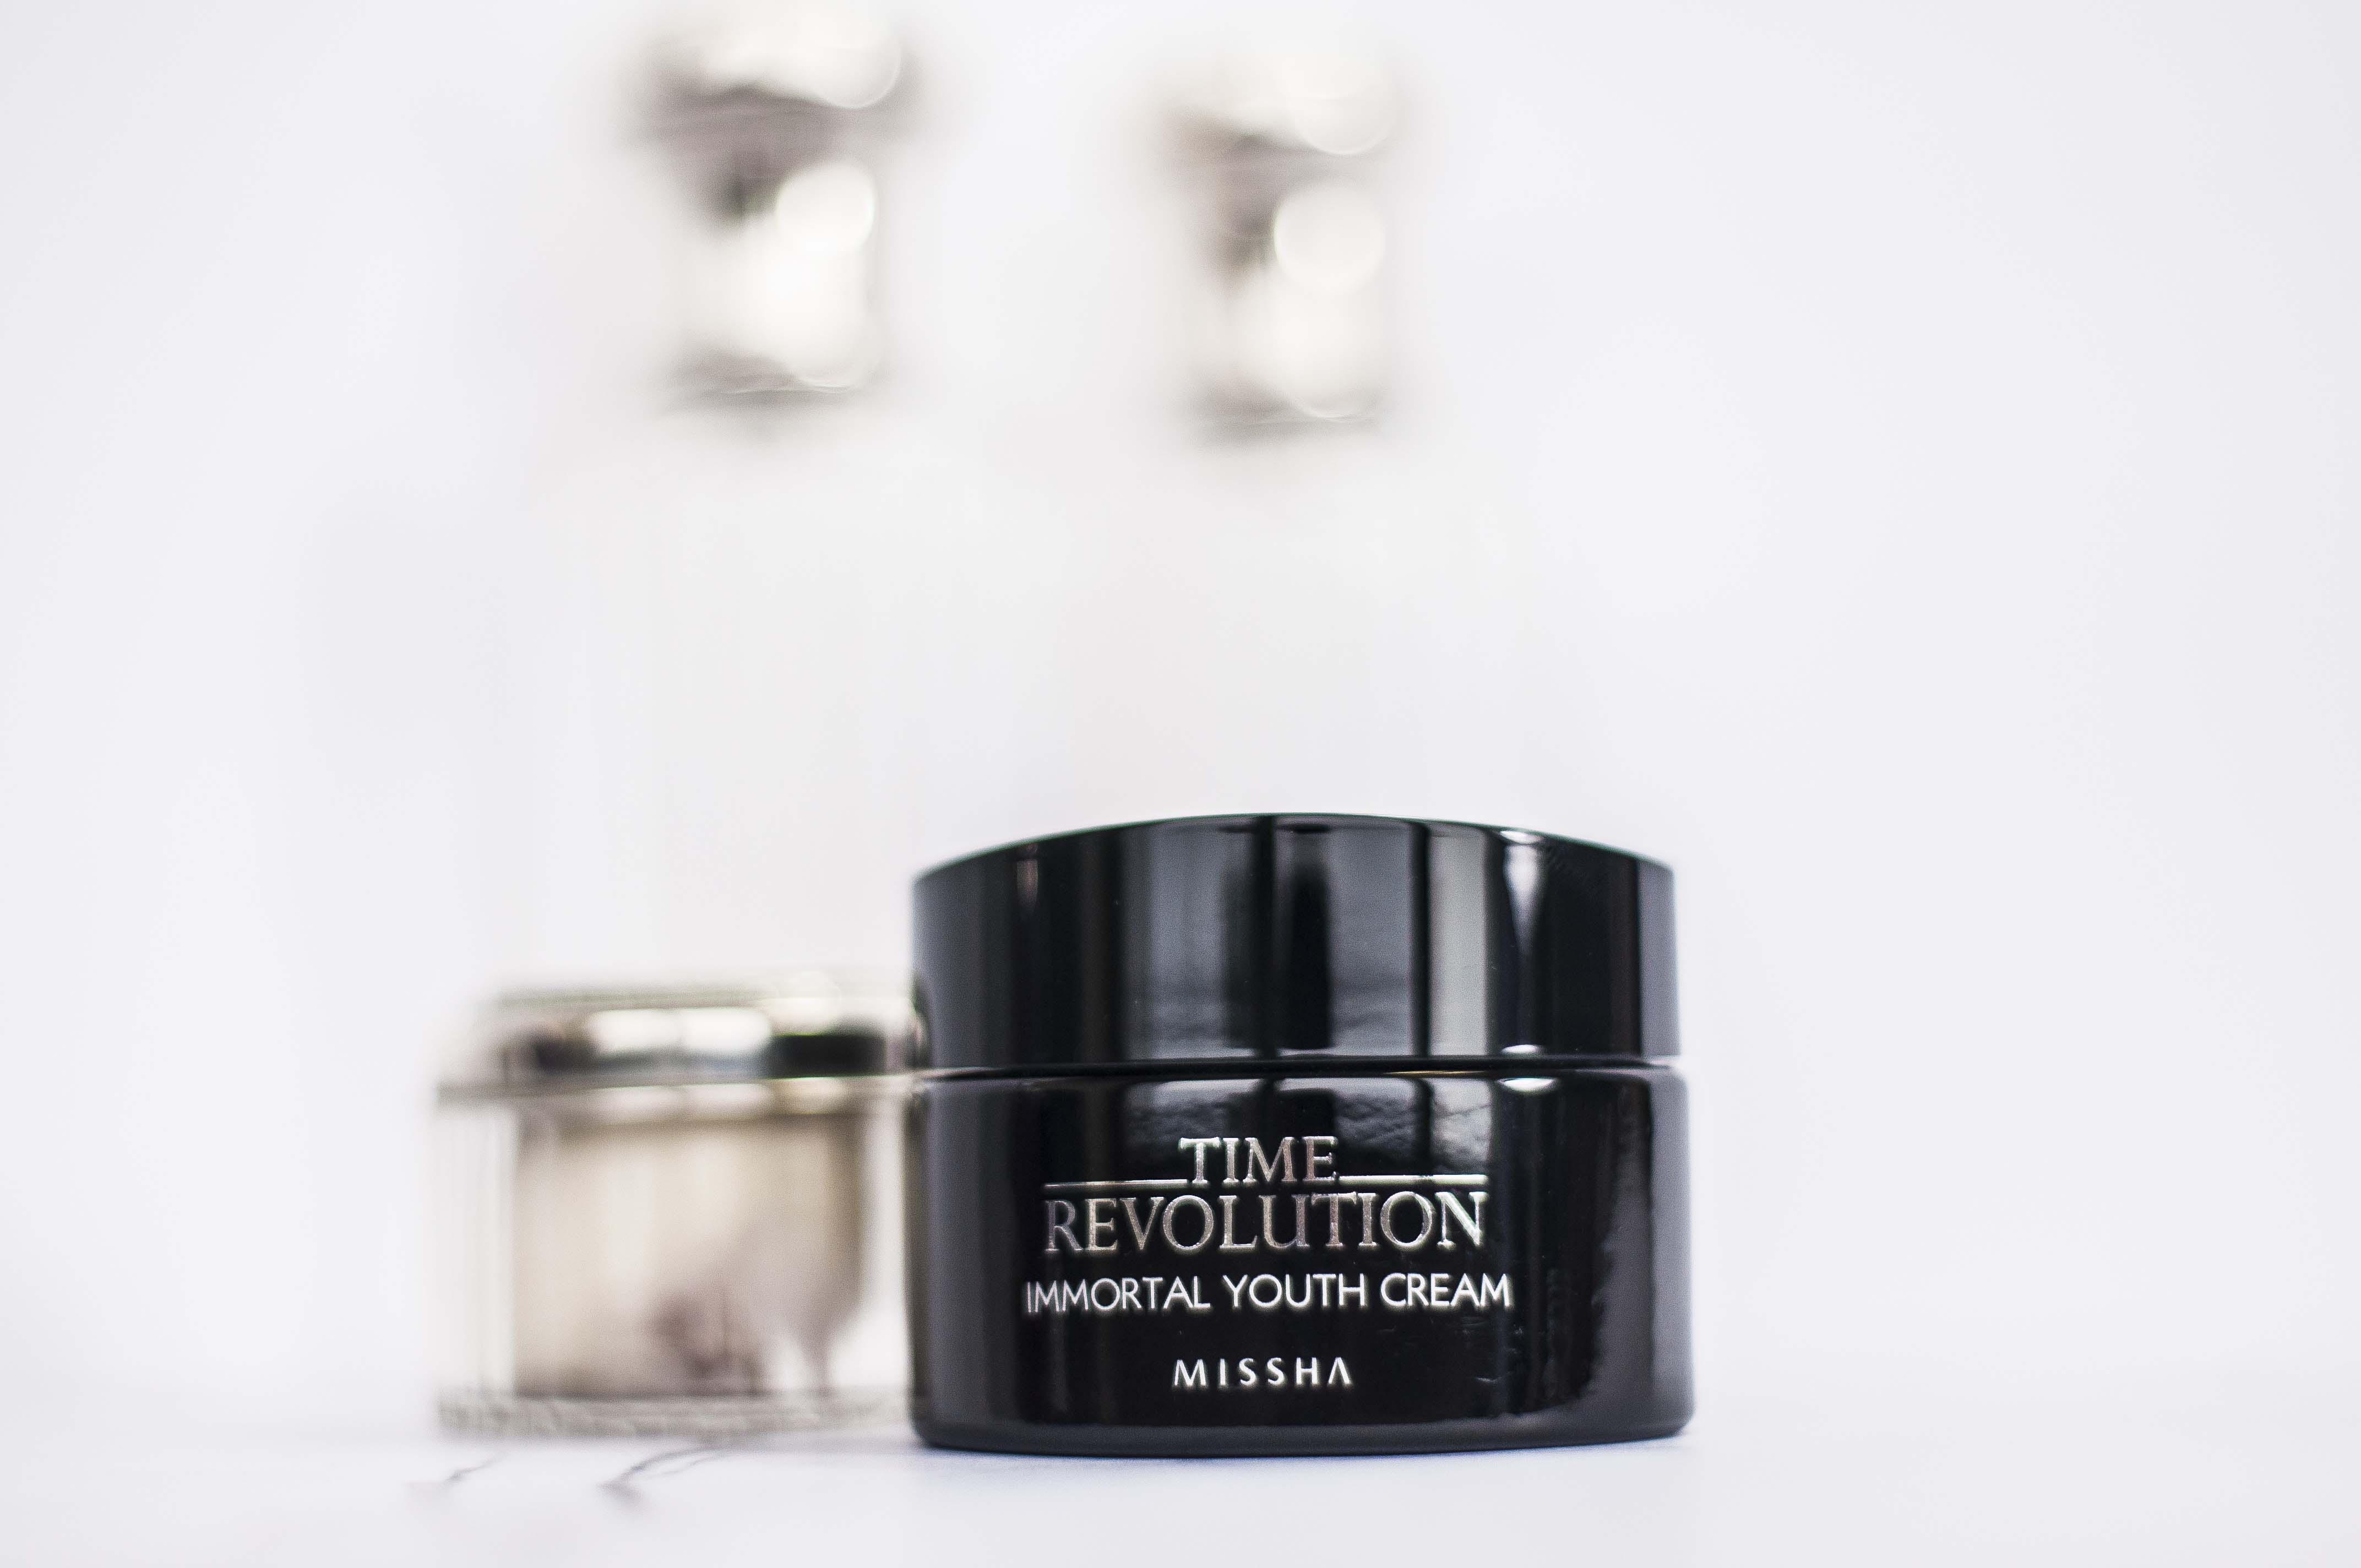 Missha Time Revolution Immortal Youth Cream Blueberry Cosmetics